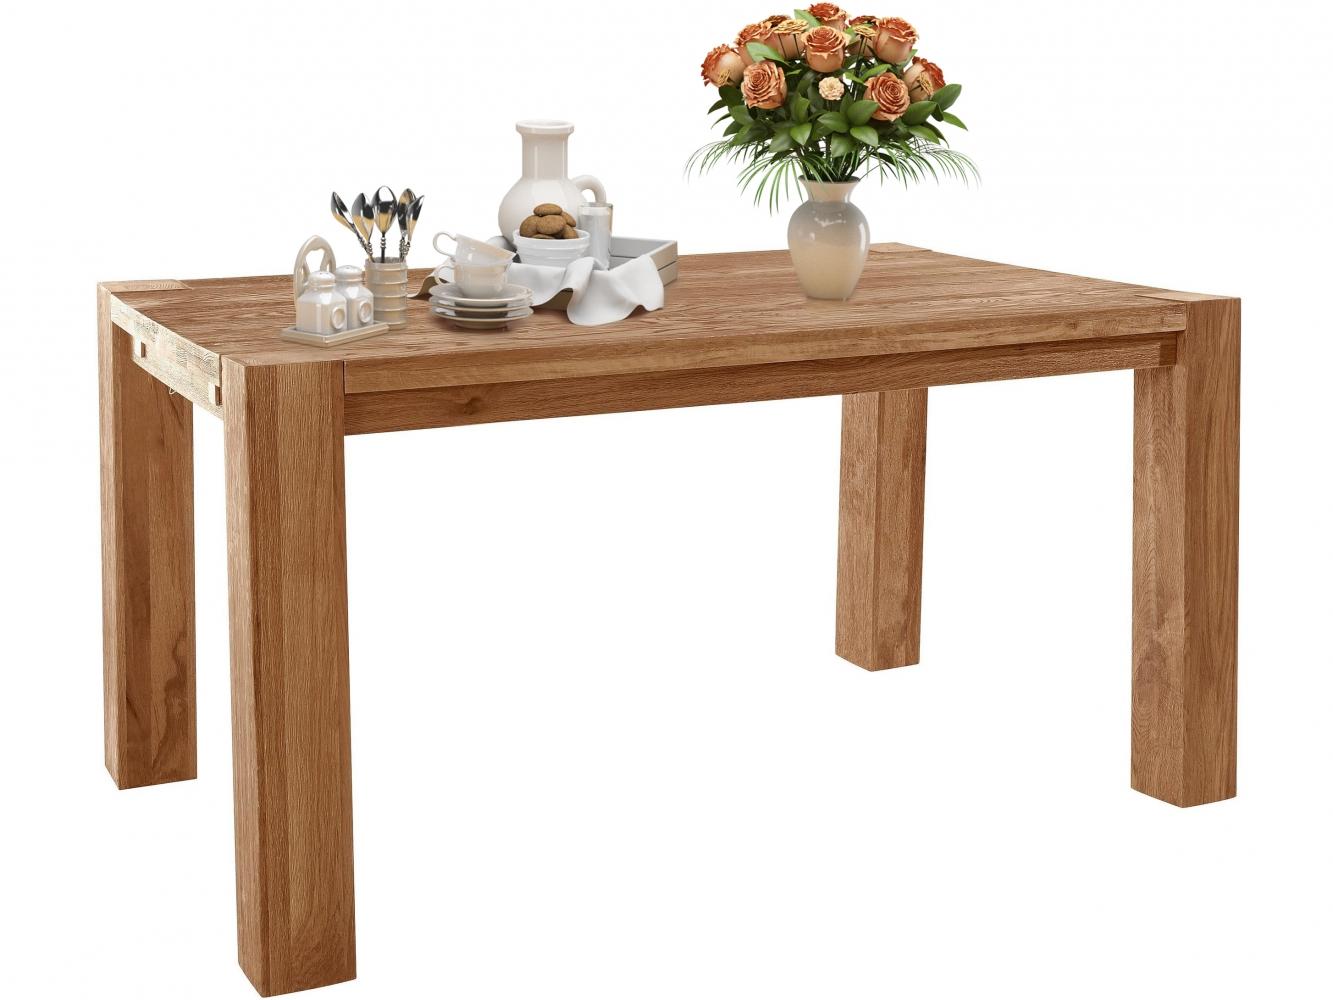 Jídelní stůl Sibera, 160 cm, dub